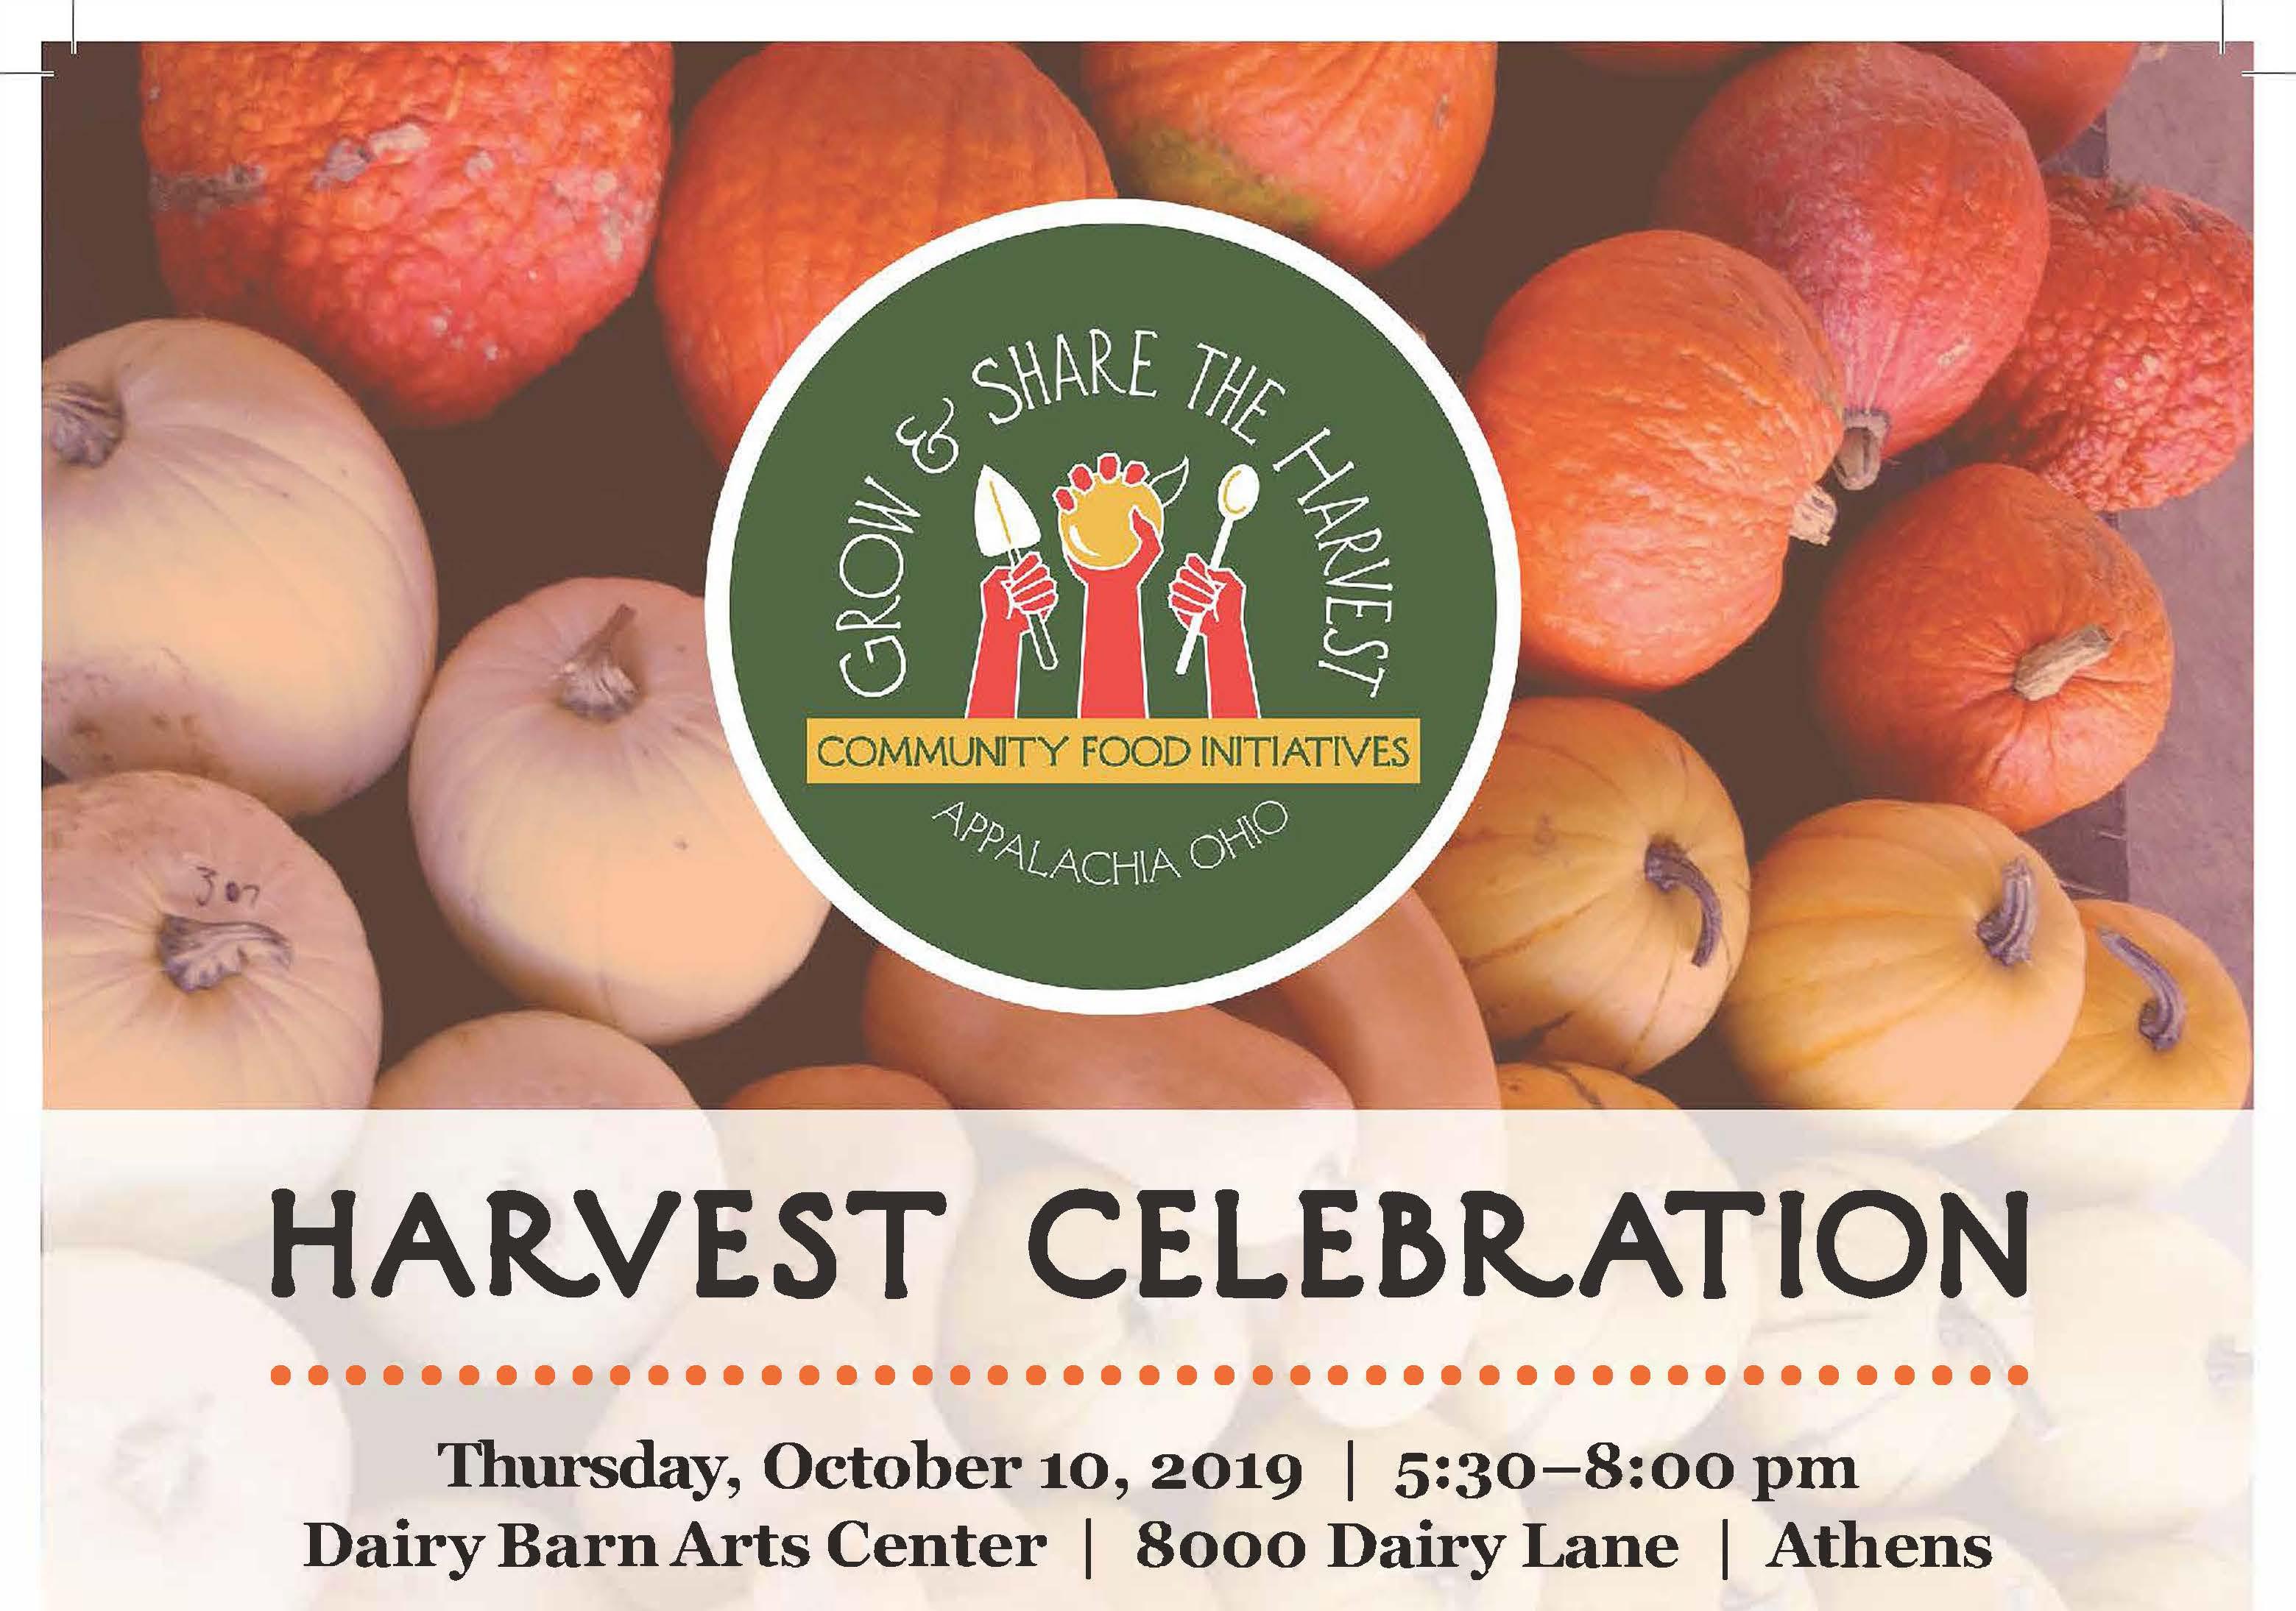 2019 Harvest Celebration